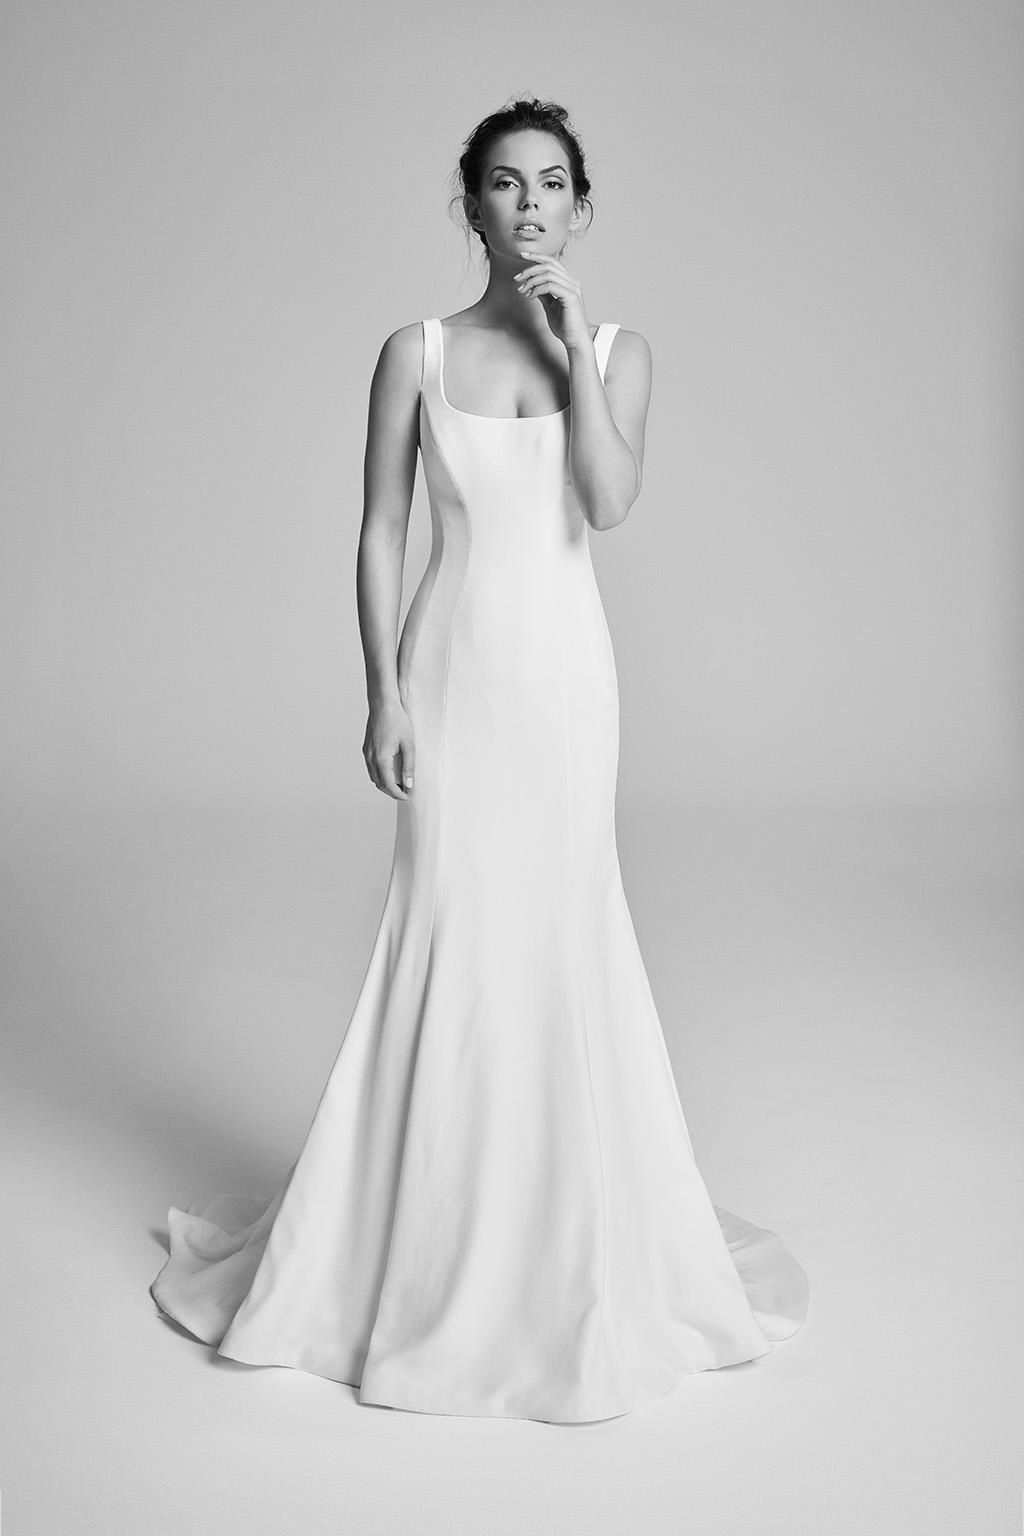 coco-bridalcouture-wedding-dresses-uk-belle-epoque-collection-2018-by-designer-suzanne-neville